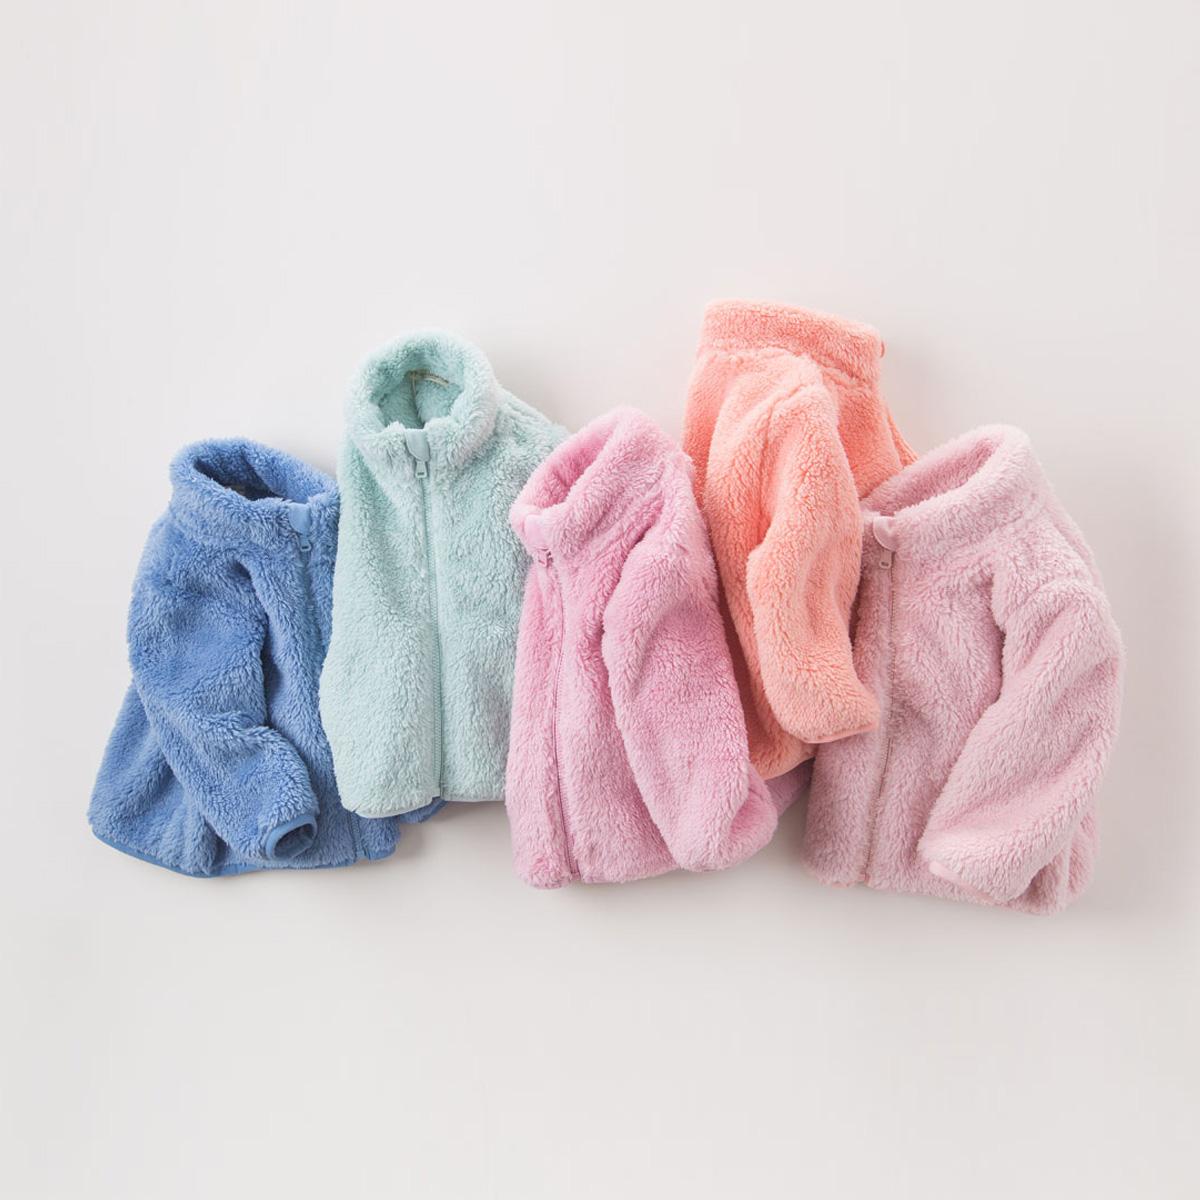 davebella 戴维贝拉 男女童冬季外套 宝宝毛绒长袖外套 84.1元(10元定金,双11付尾款)